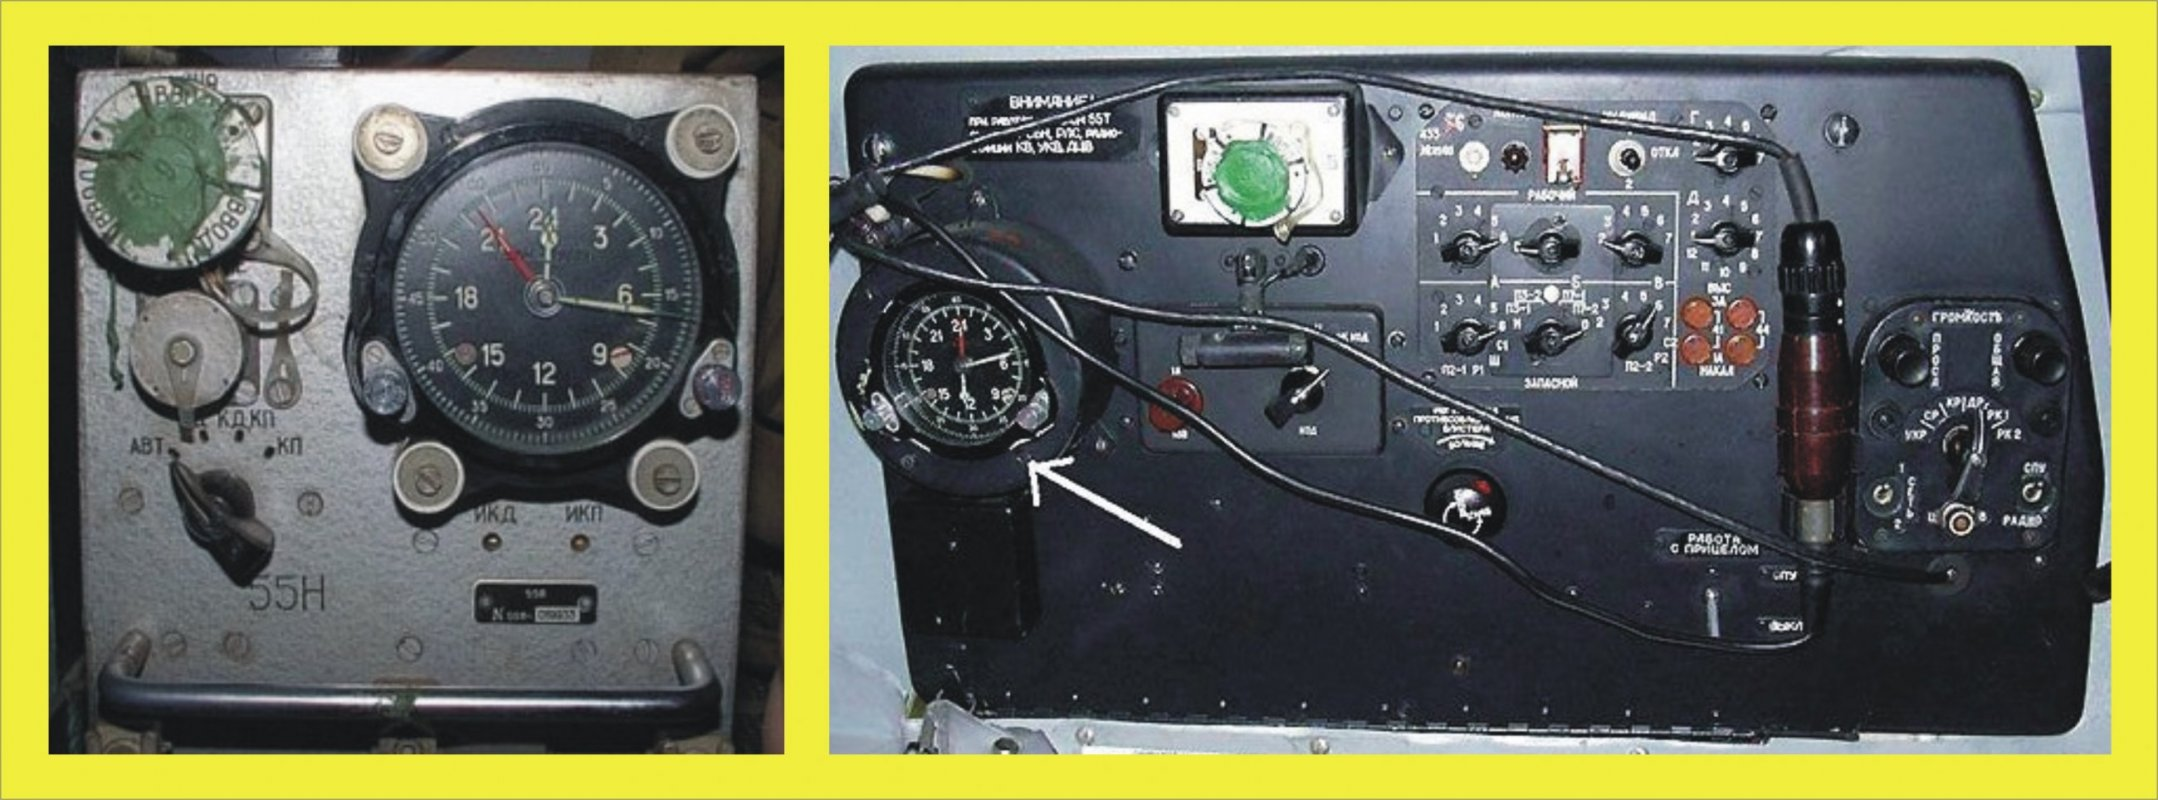 6301-System.JPG